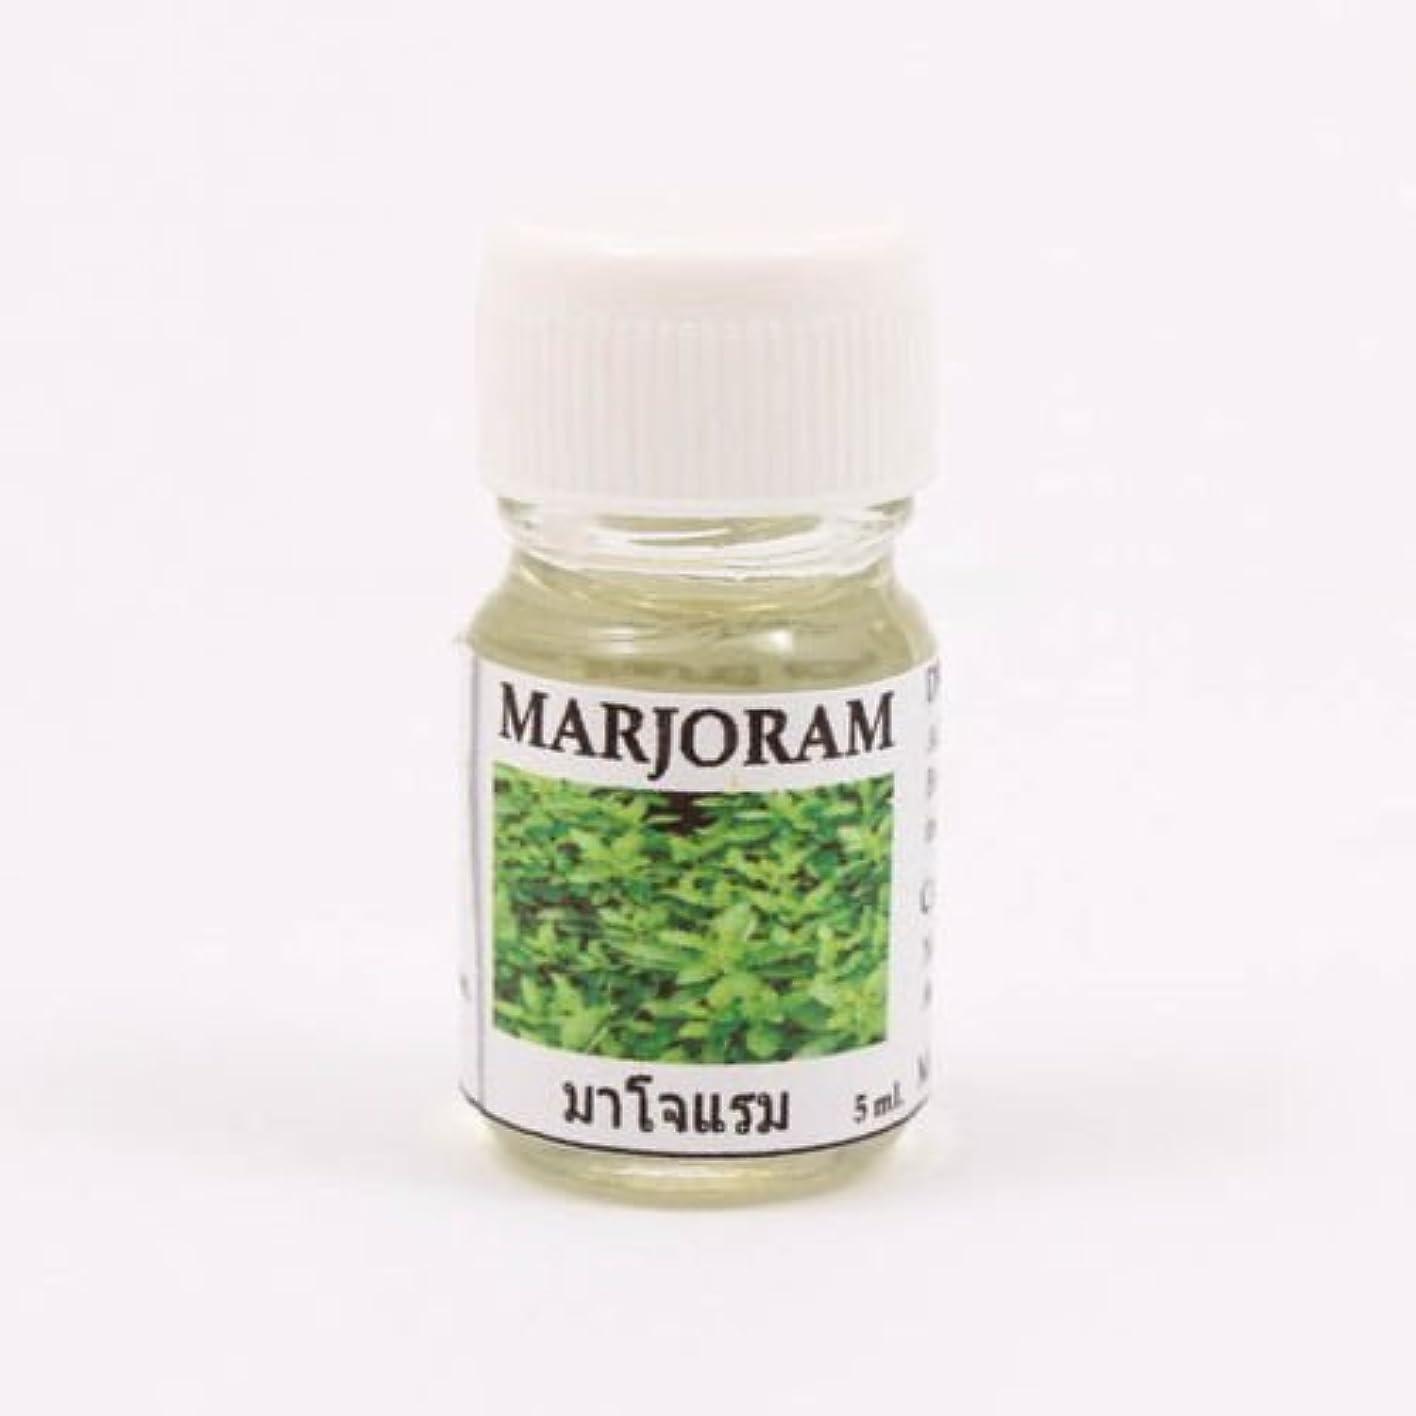 6X Marjoram Aroma Fragrance Essential Oil 5ML (cc) Diffuser Burner Therapy